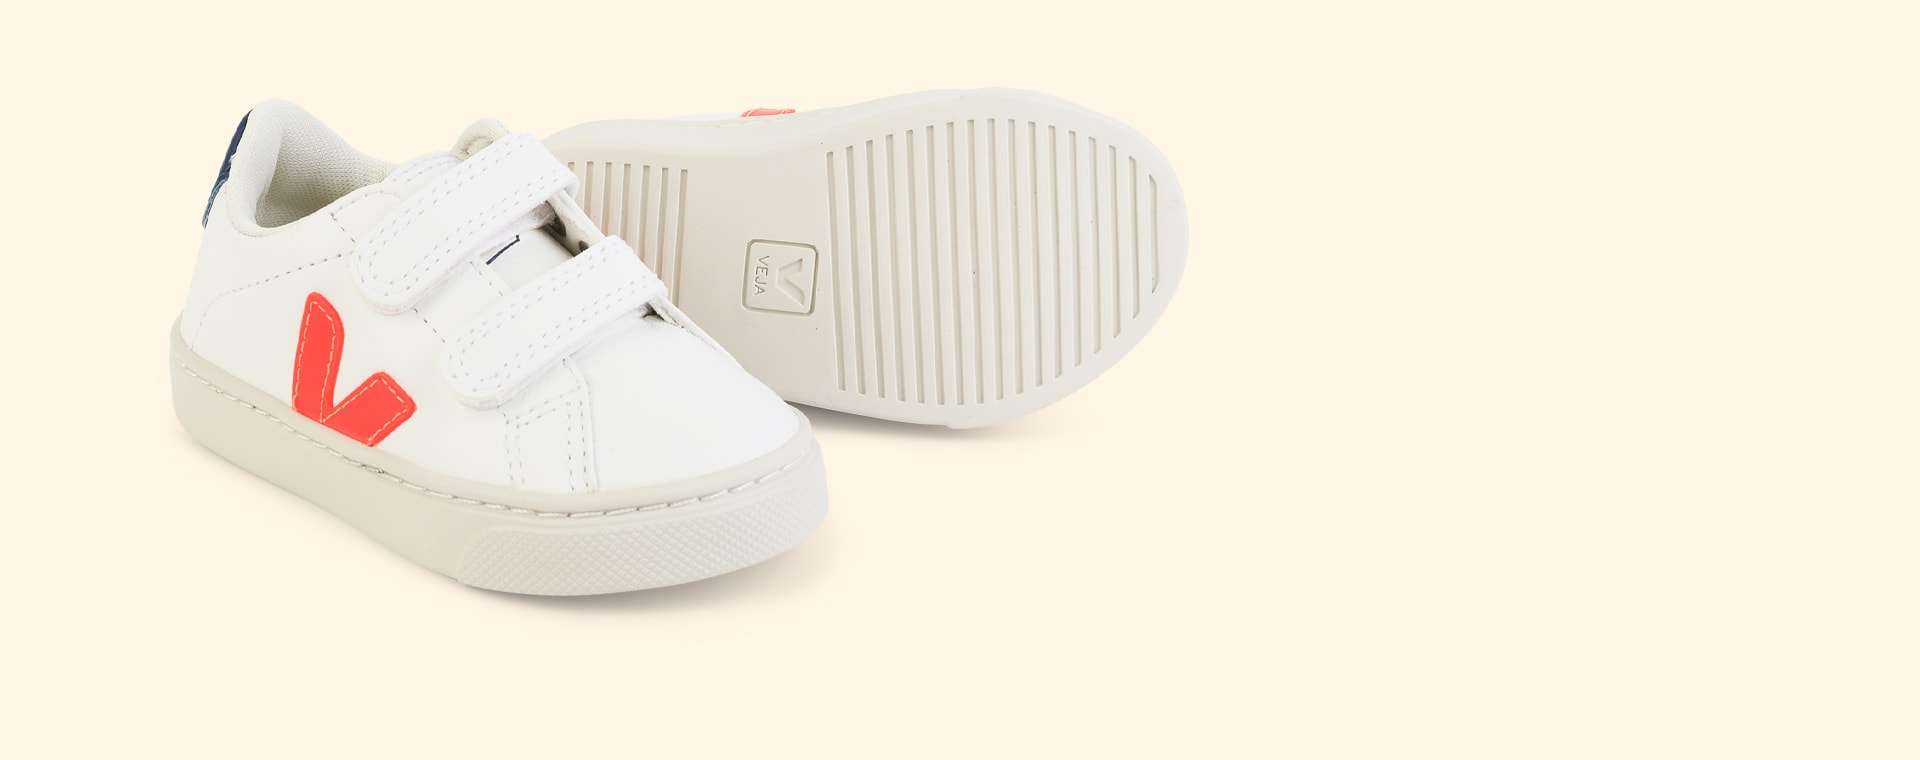 Orange Fluo Cobalt Veja Esplar Small Velcro Trainer